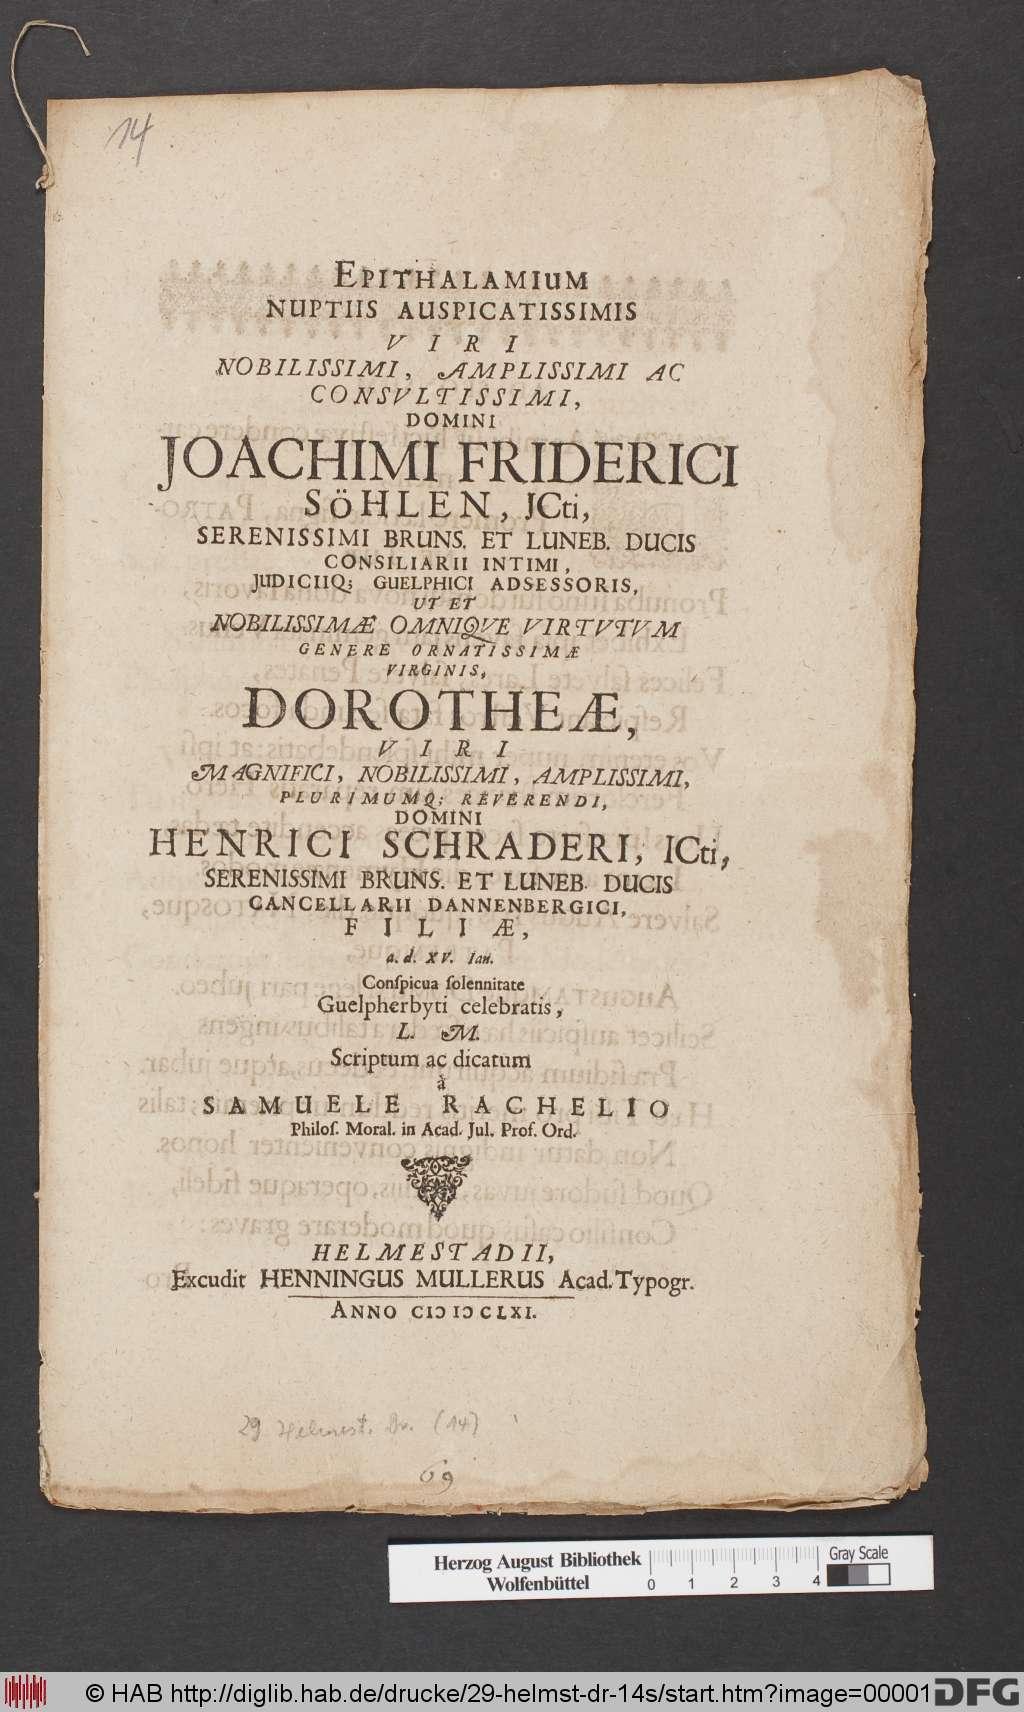 http://diglib.hab.de/drucke/29-helmst-dr-14s/00001.jpg